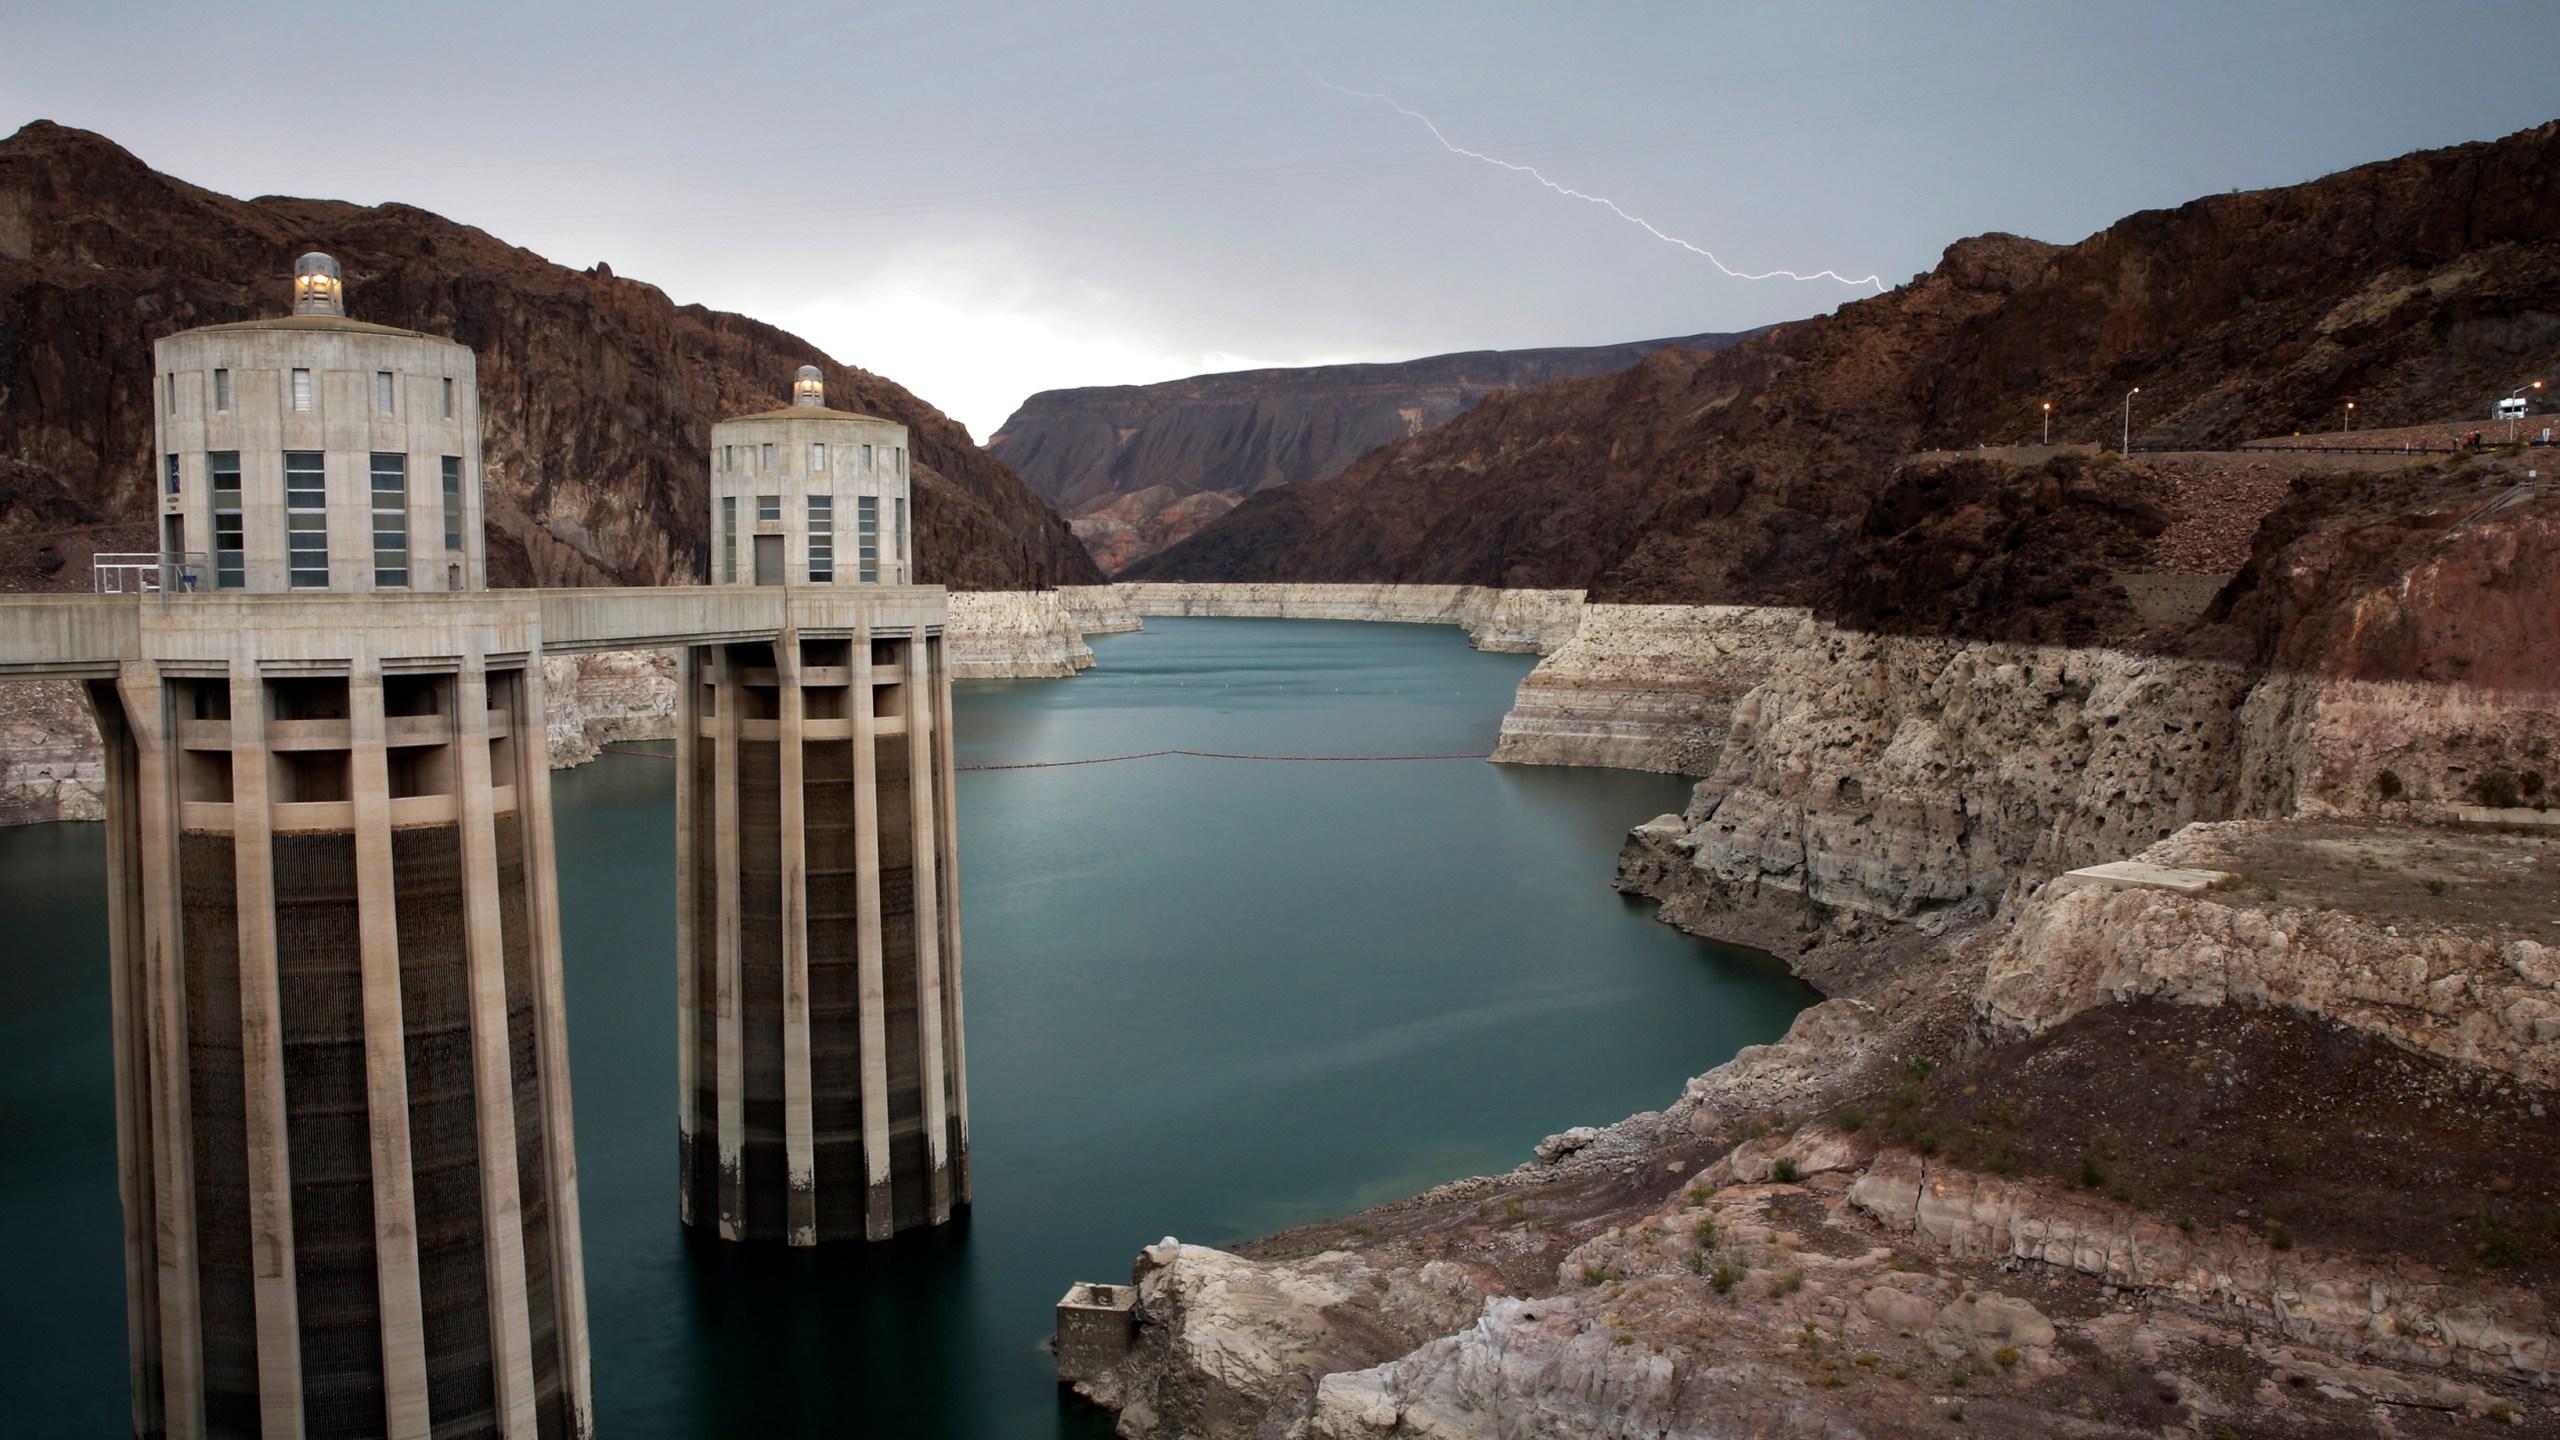 Colorado_River_Water_Drought_17077-159532.jpg69730706